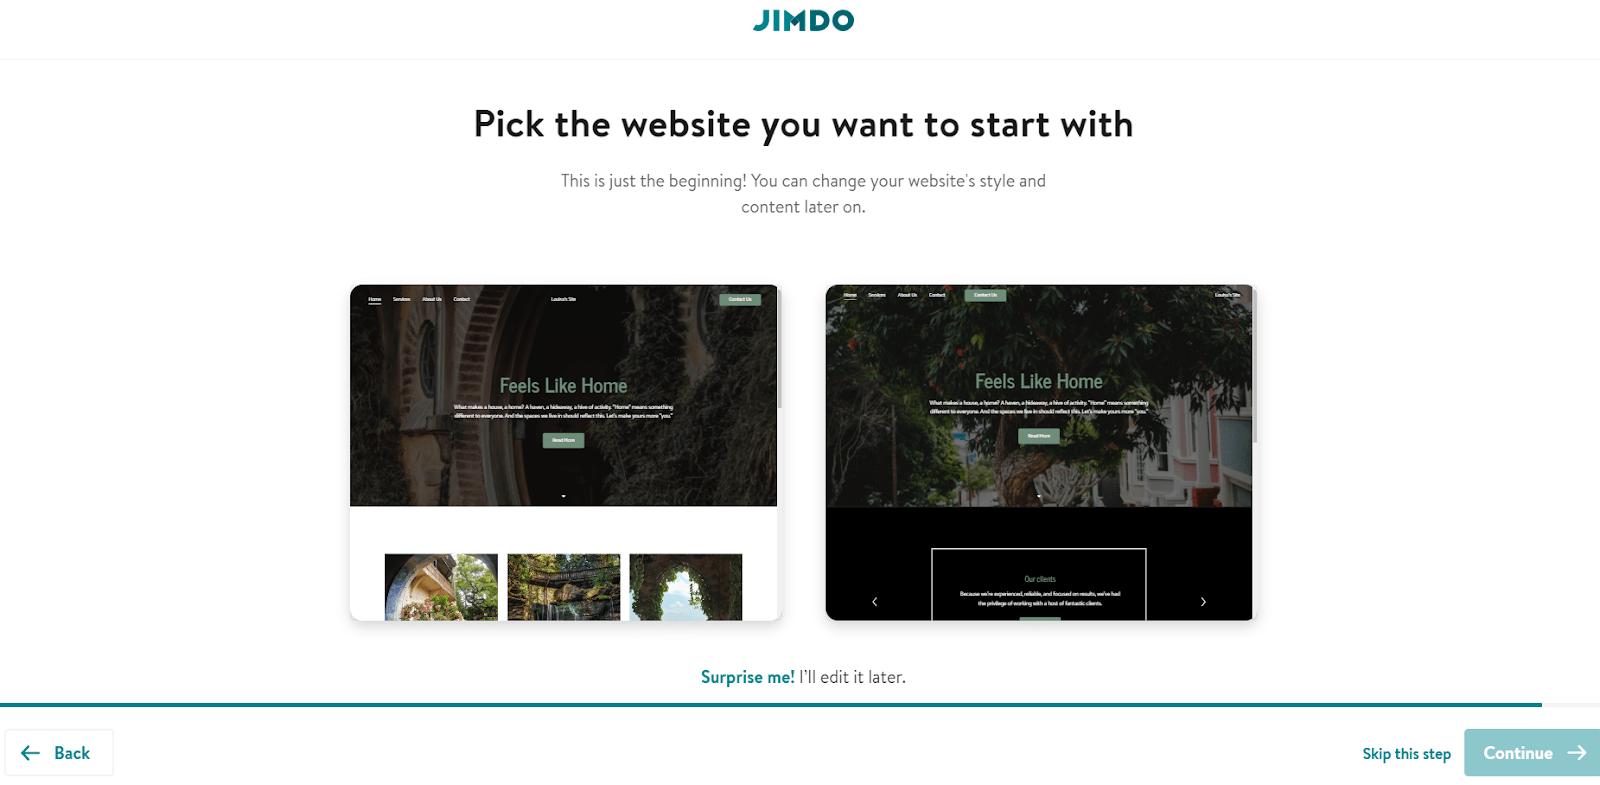 Jimdo Dolphin website designs